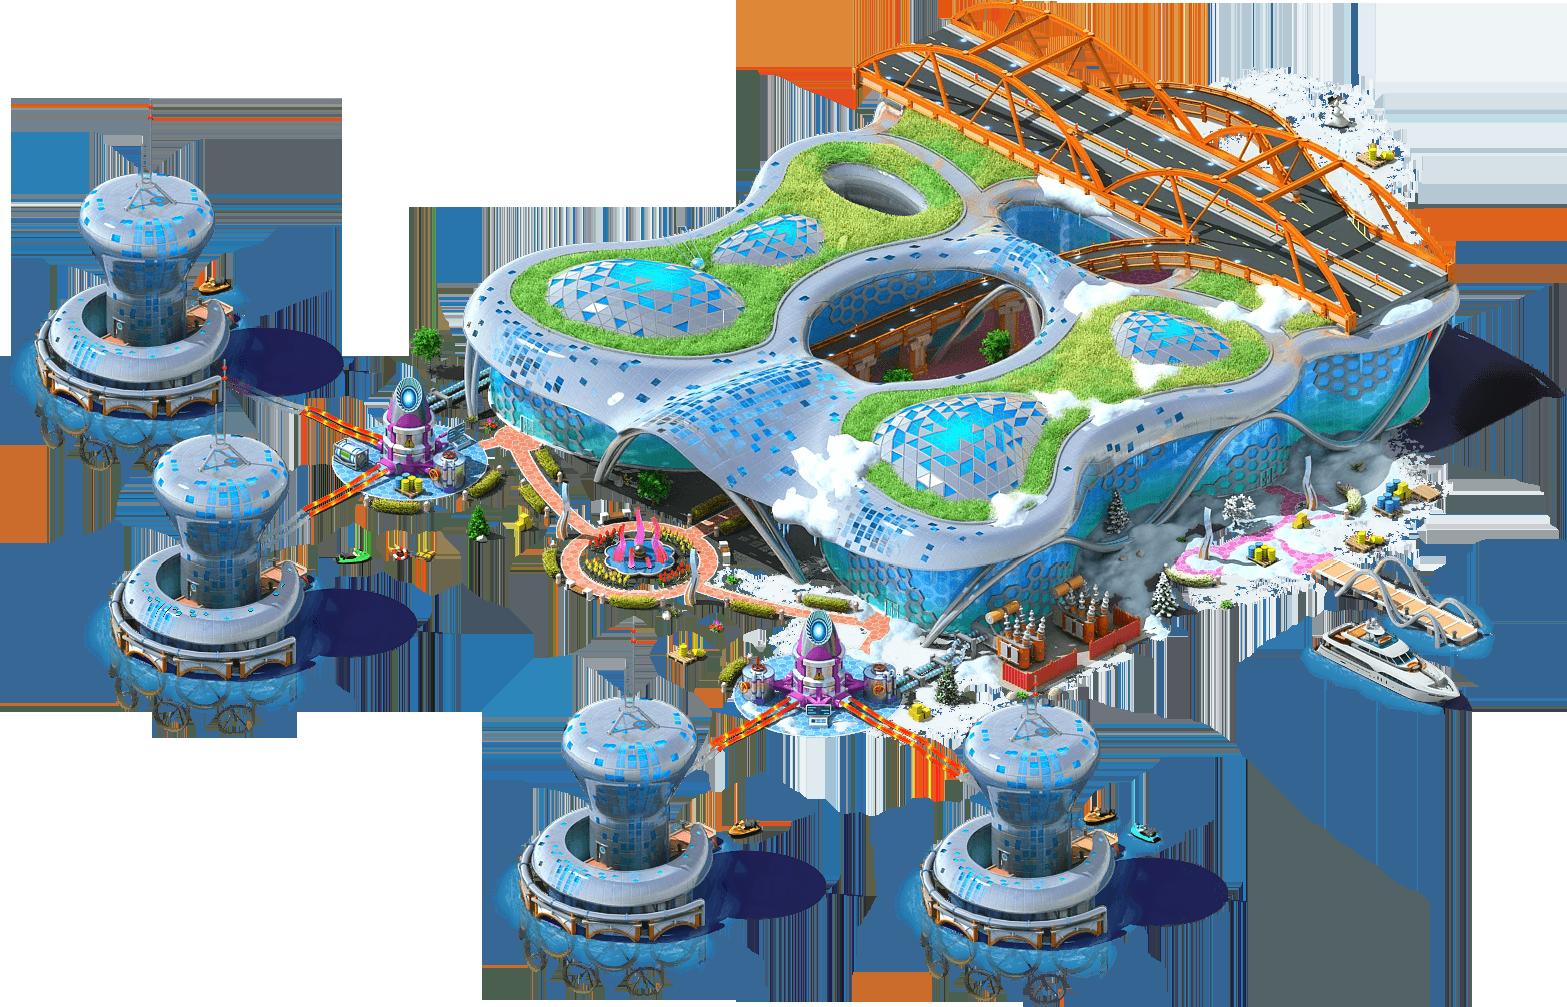 Construction clipart industrial plant. Tidal power megapolis wiki